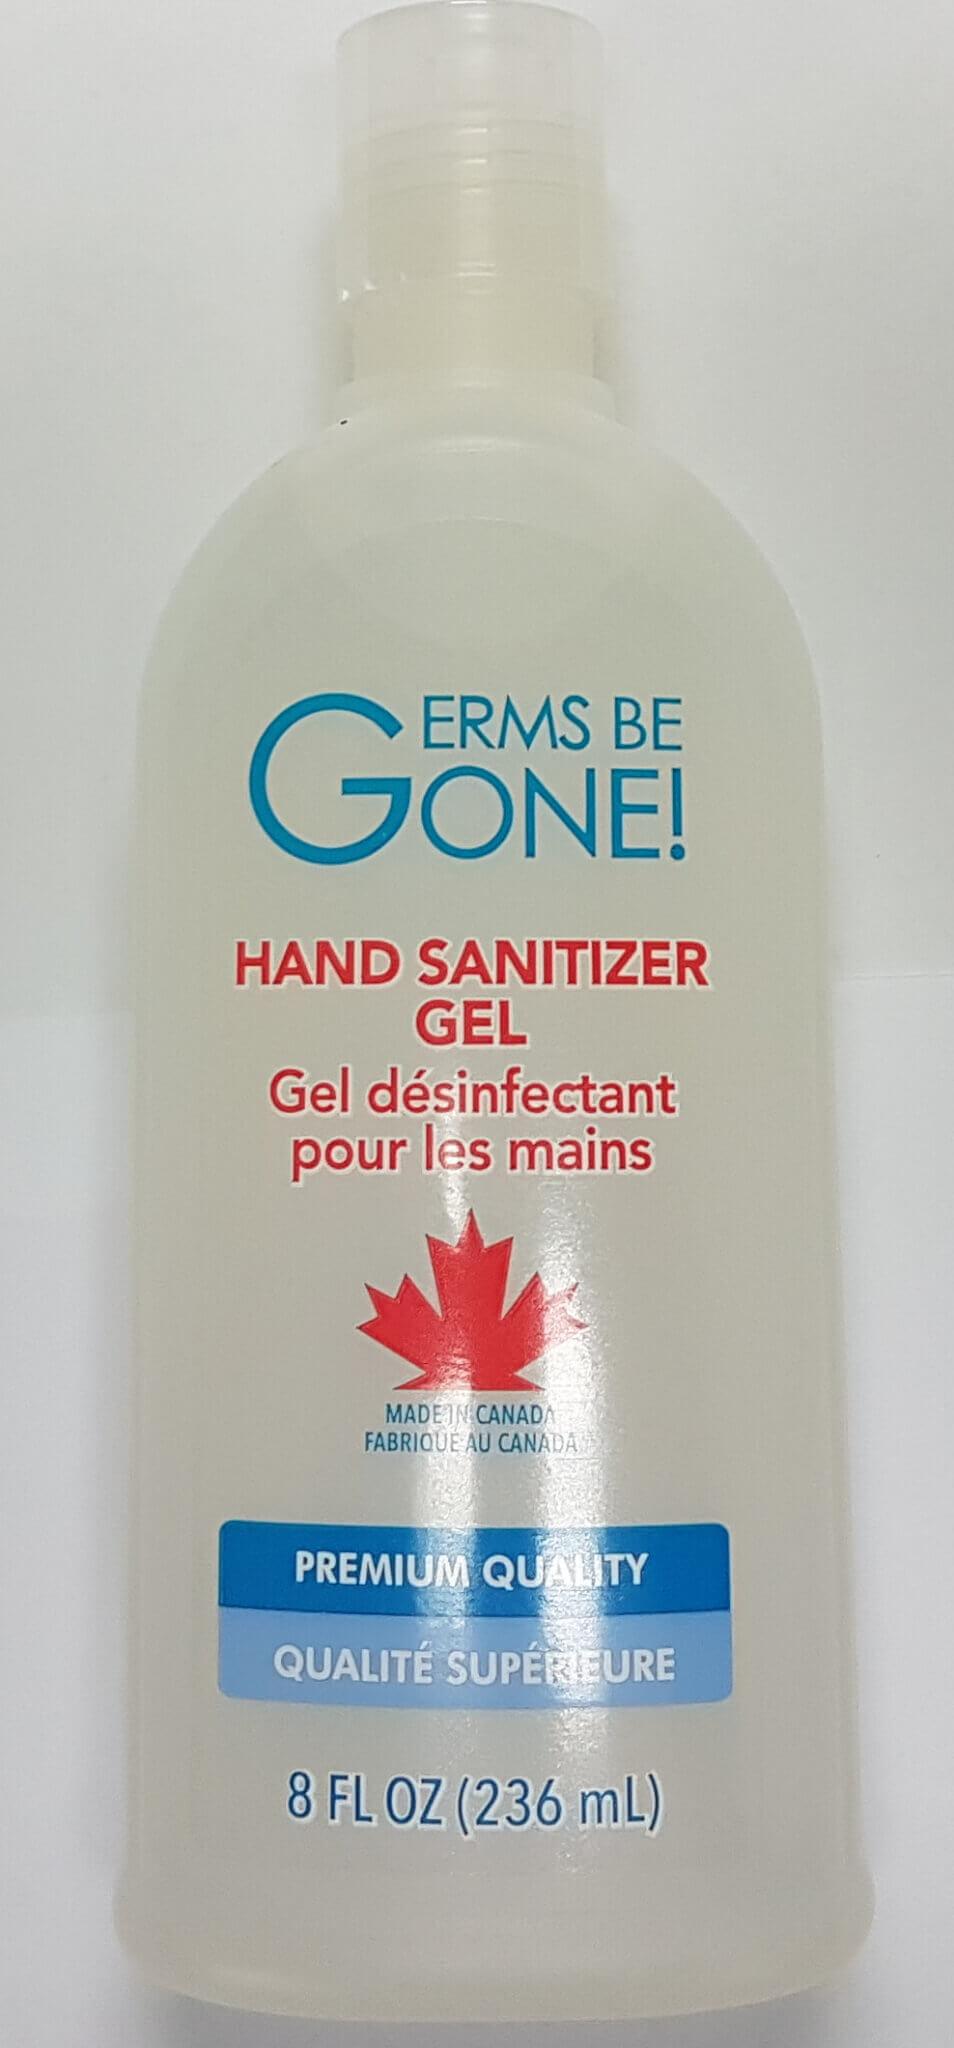 Germs Be Gone! Hand Sanitizer Gel